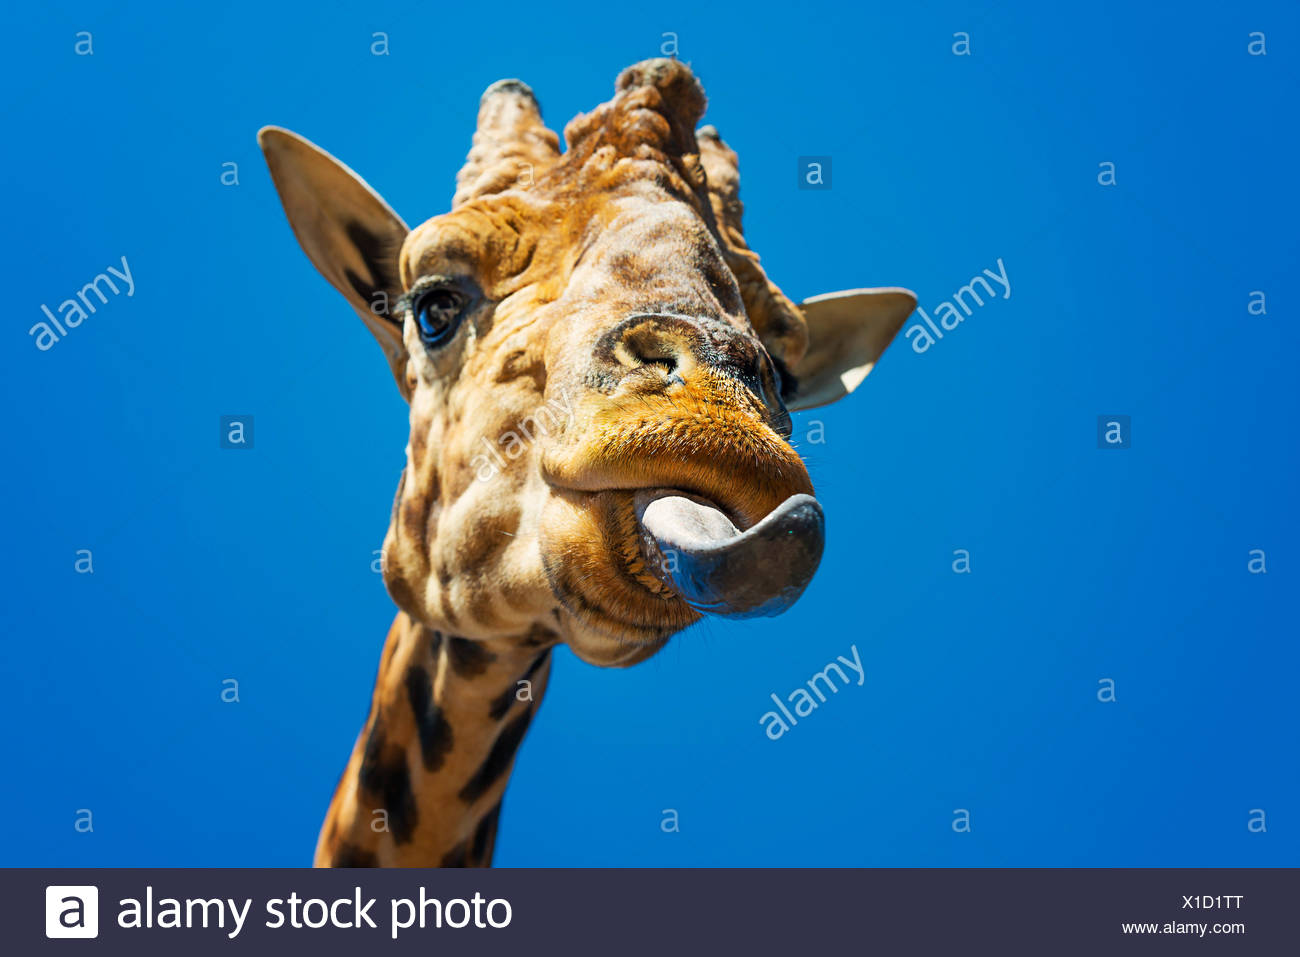 Giraffe licking its lips - Stock Image